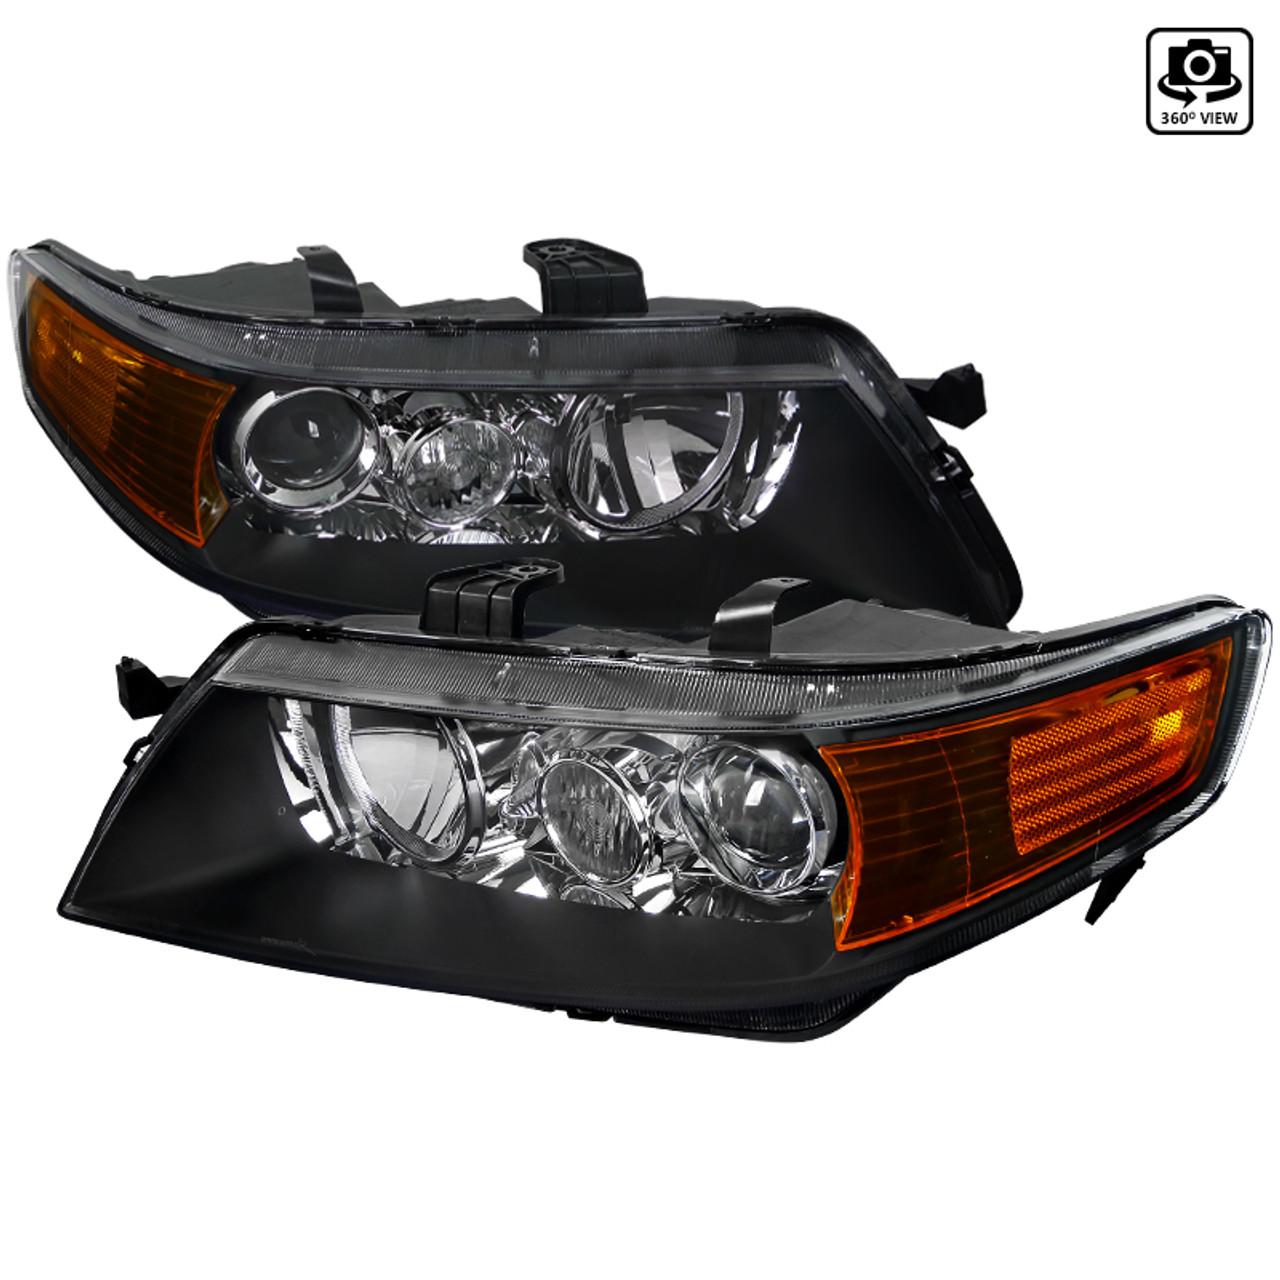 2004 2005 Acura Tsx Projector Headlights Spec D Tuning